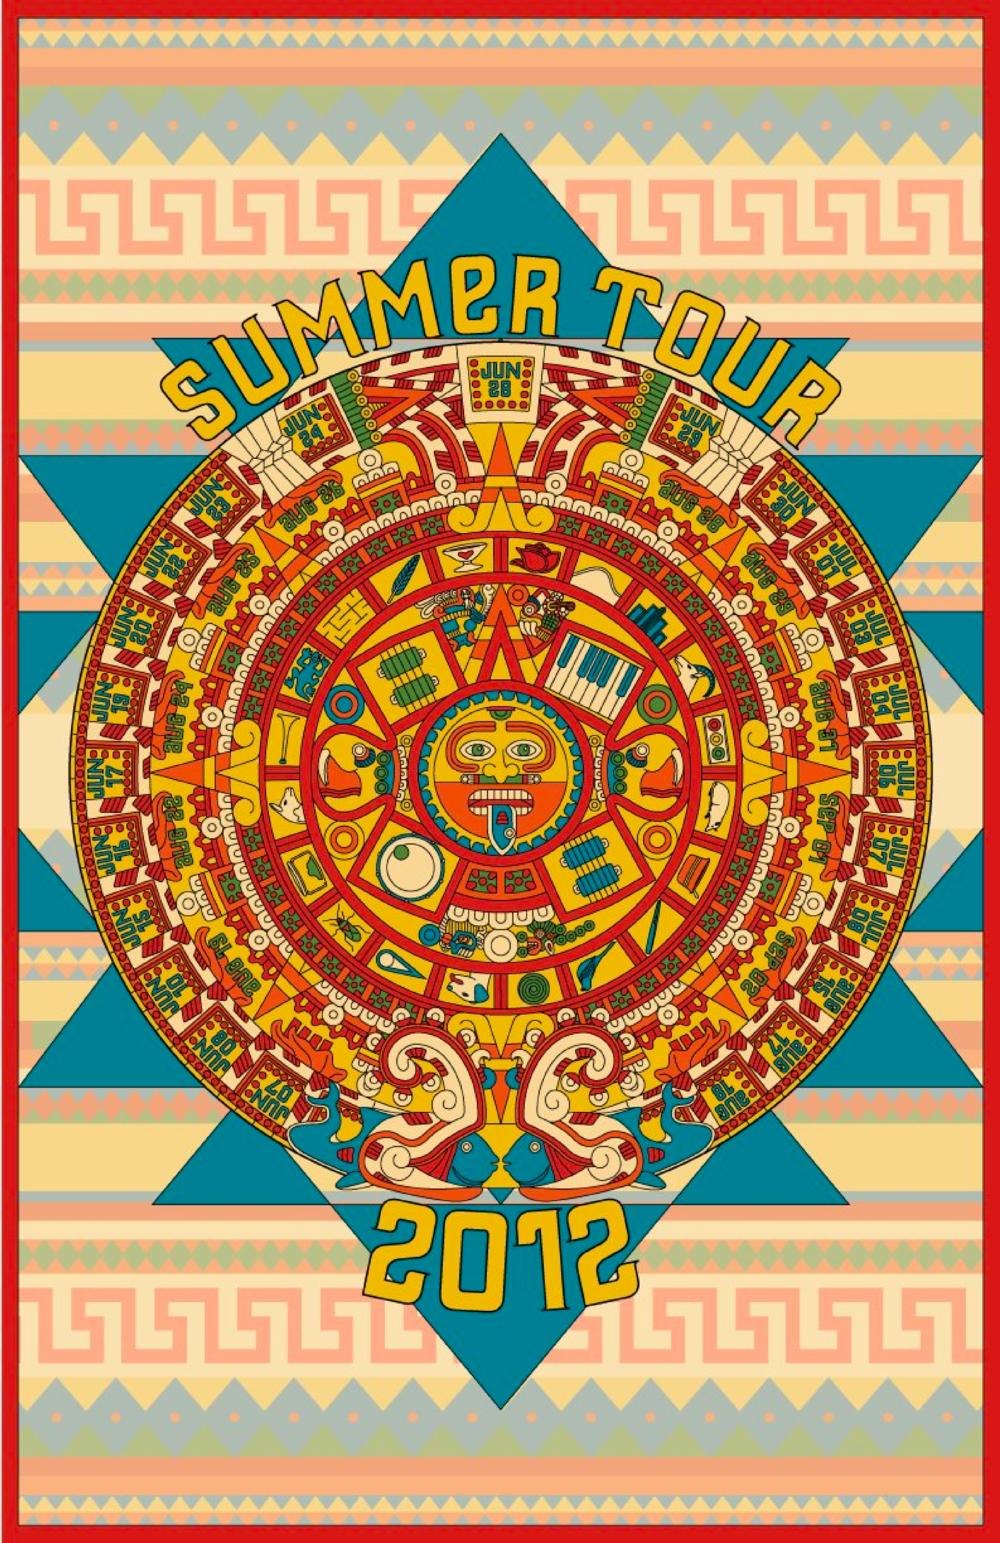 Poster & Album Art-13.png